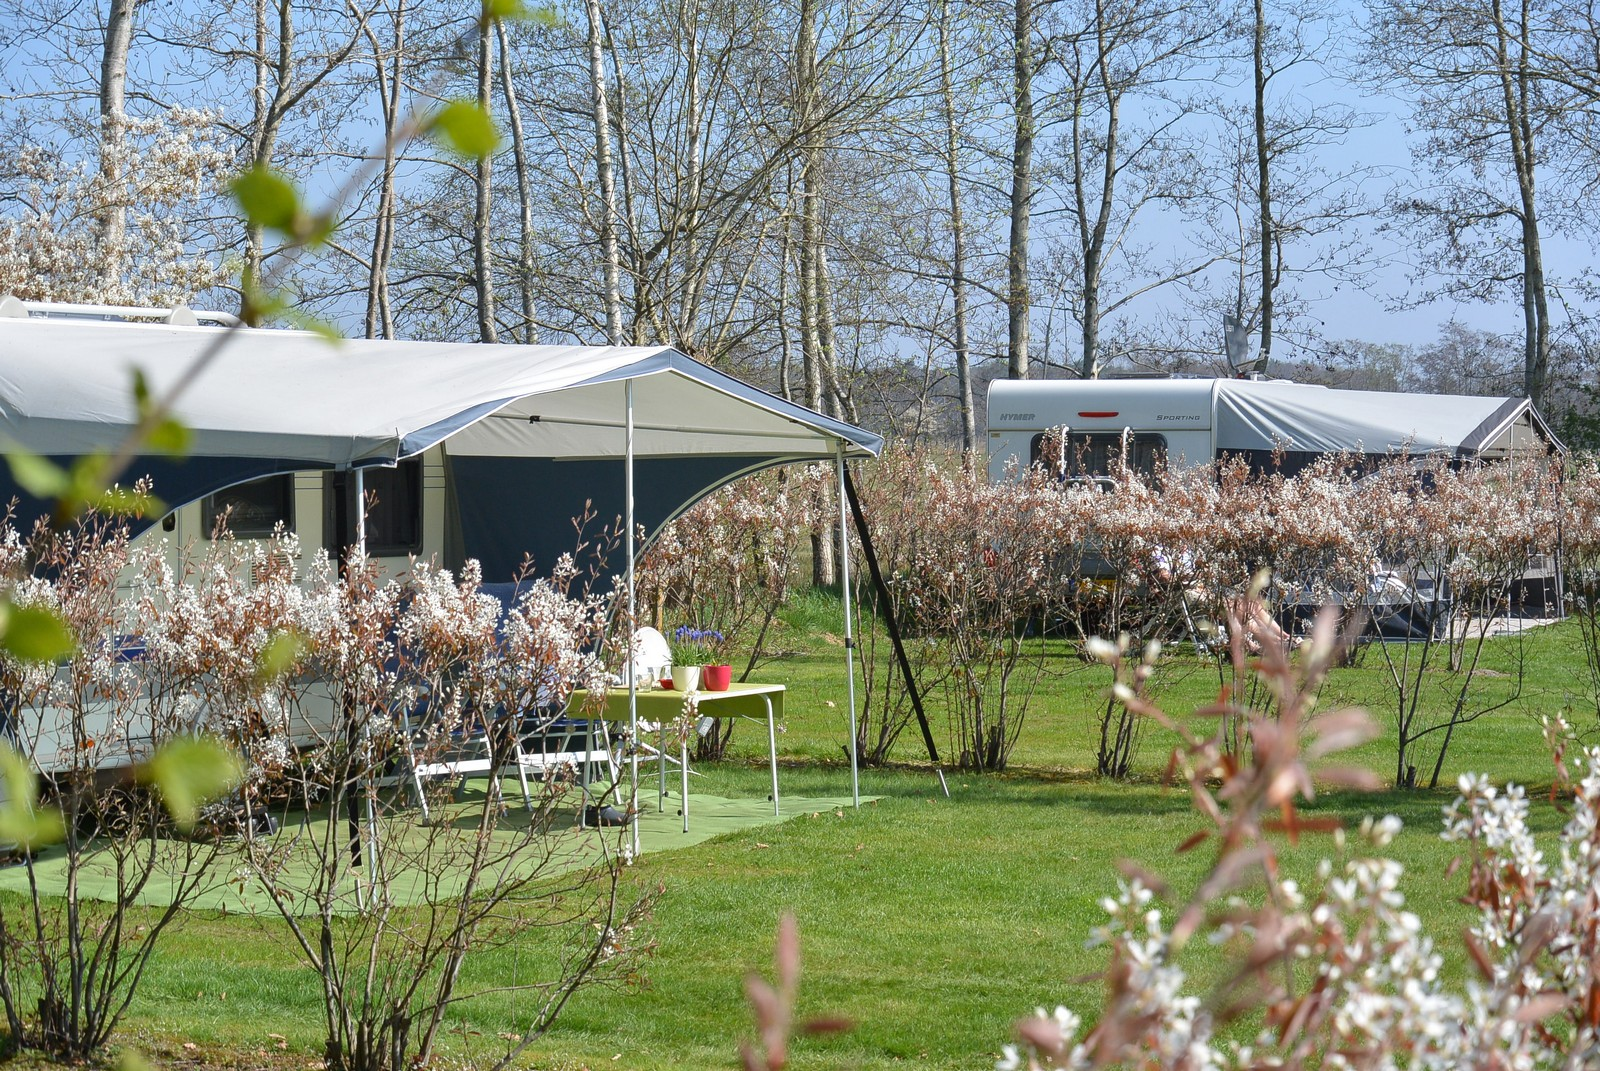 Camping_jellyshoeve_havelte01